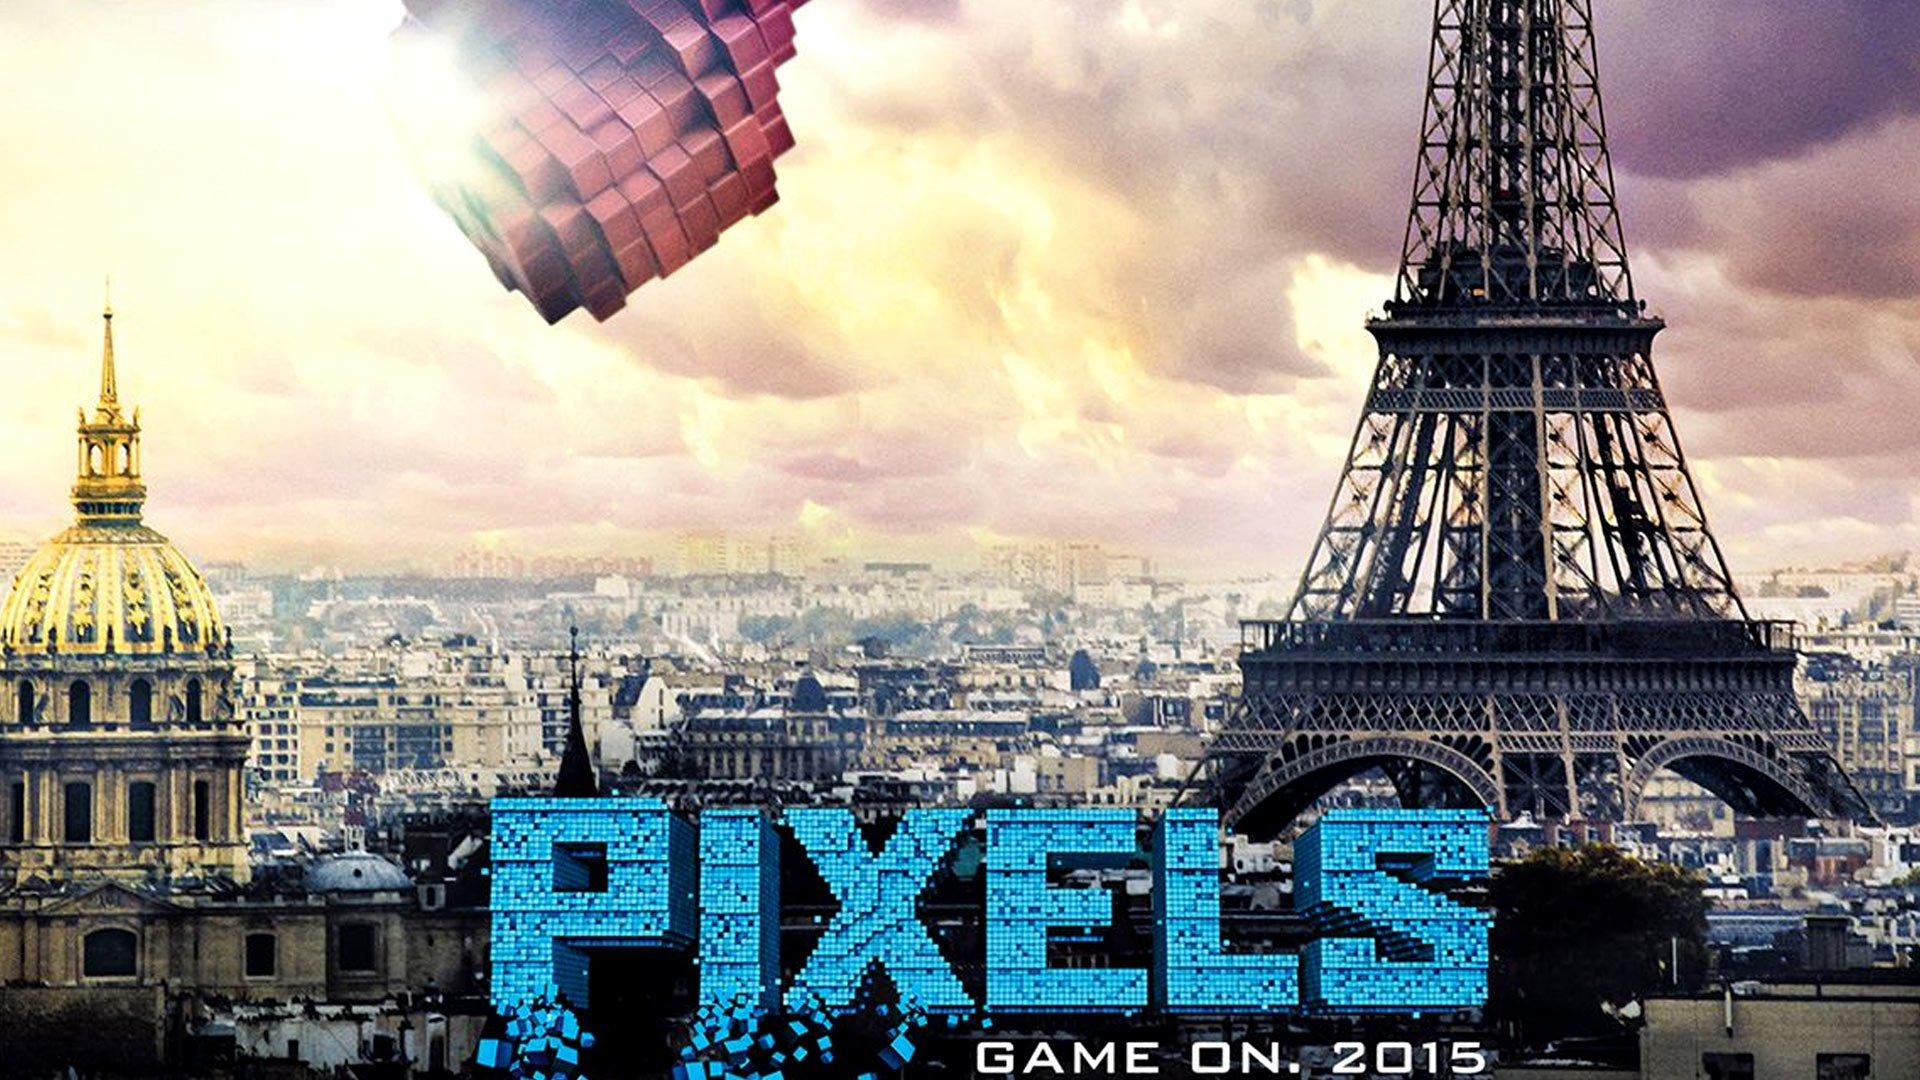 pixels_movie_poster_wallpaper_hd